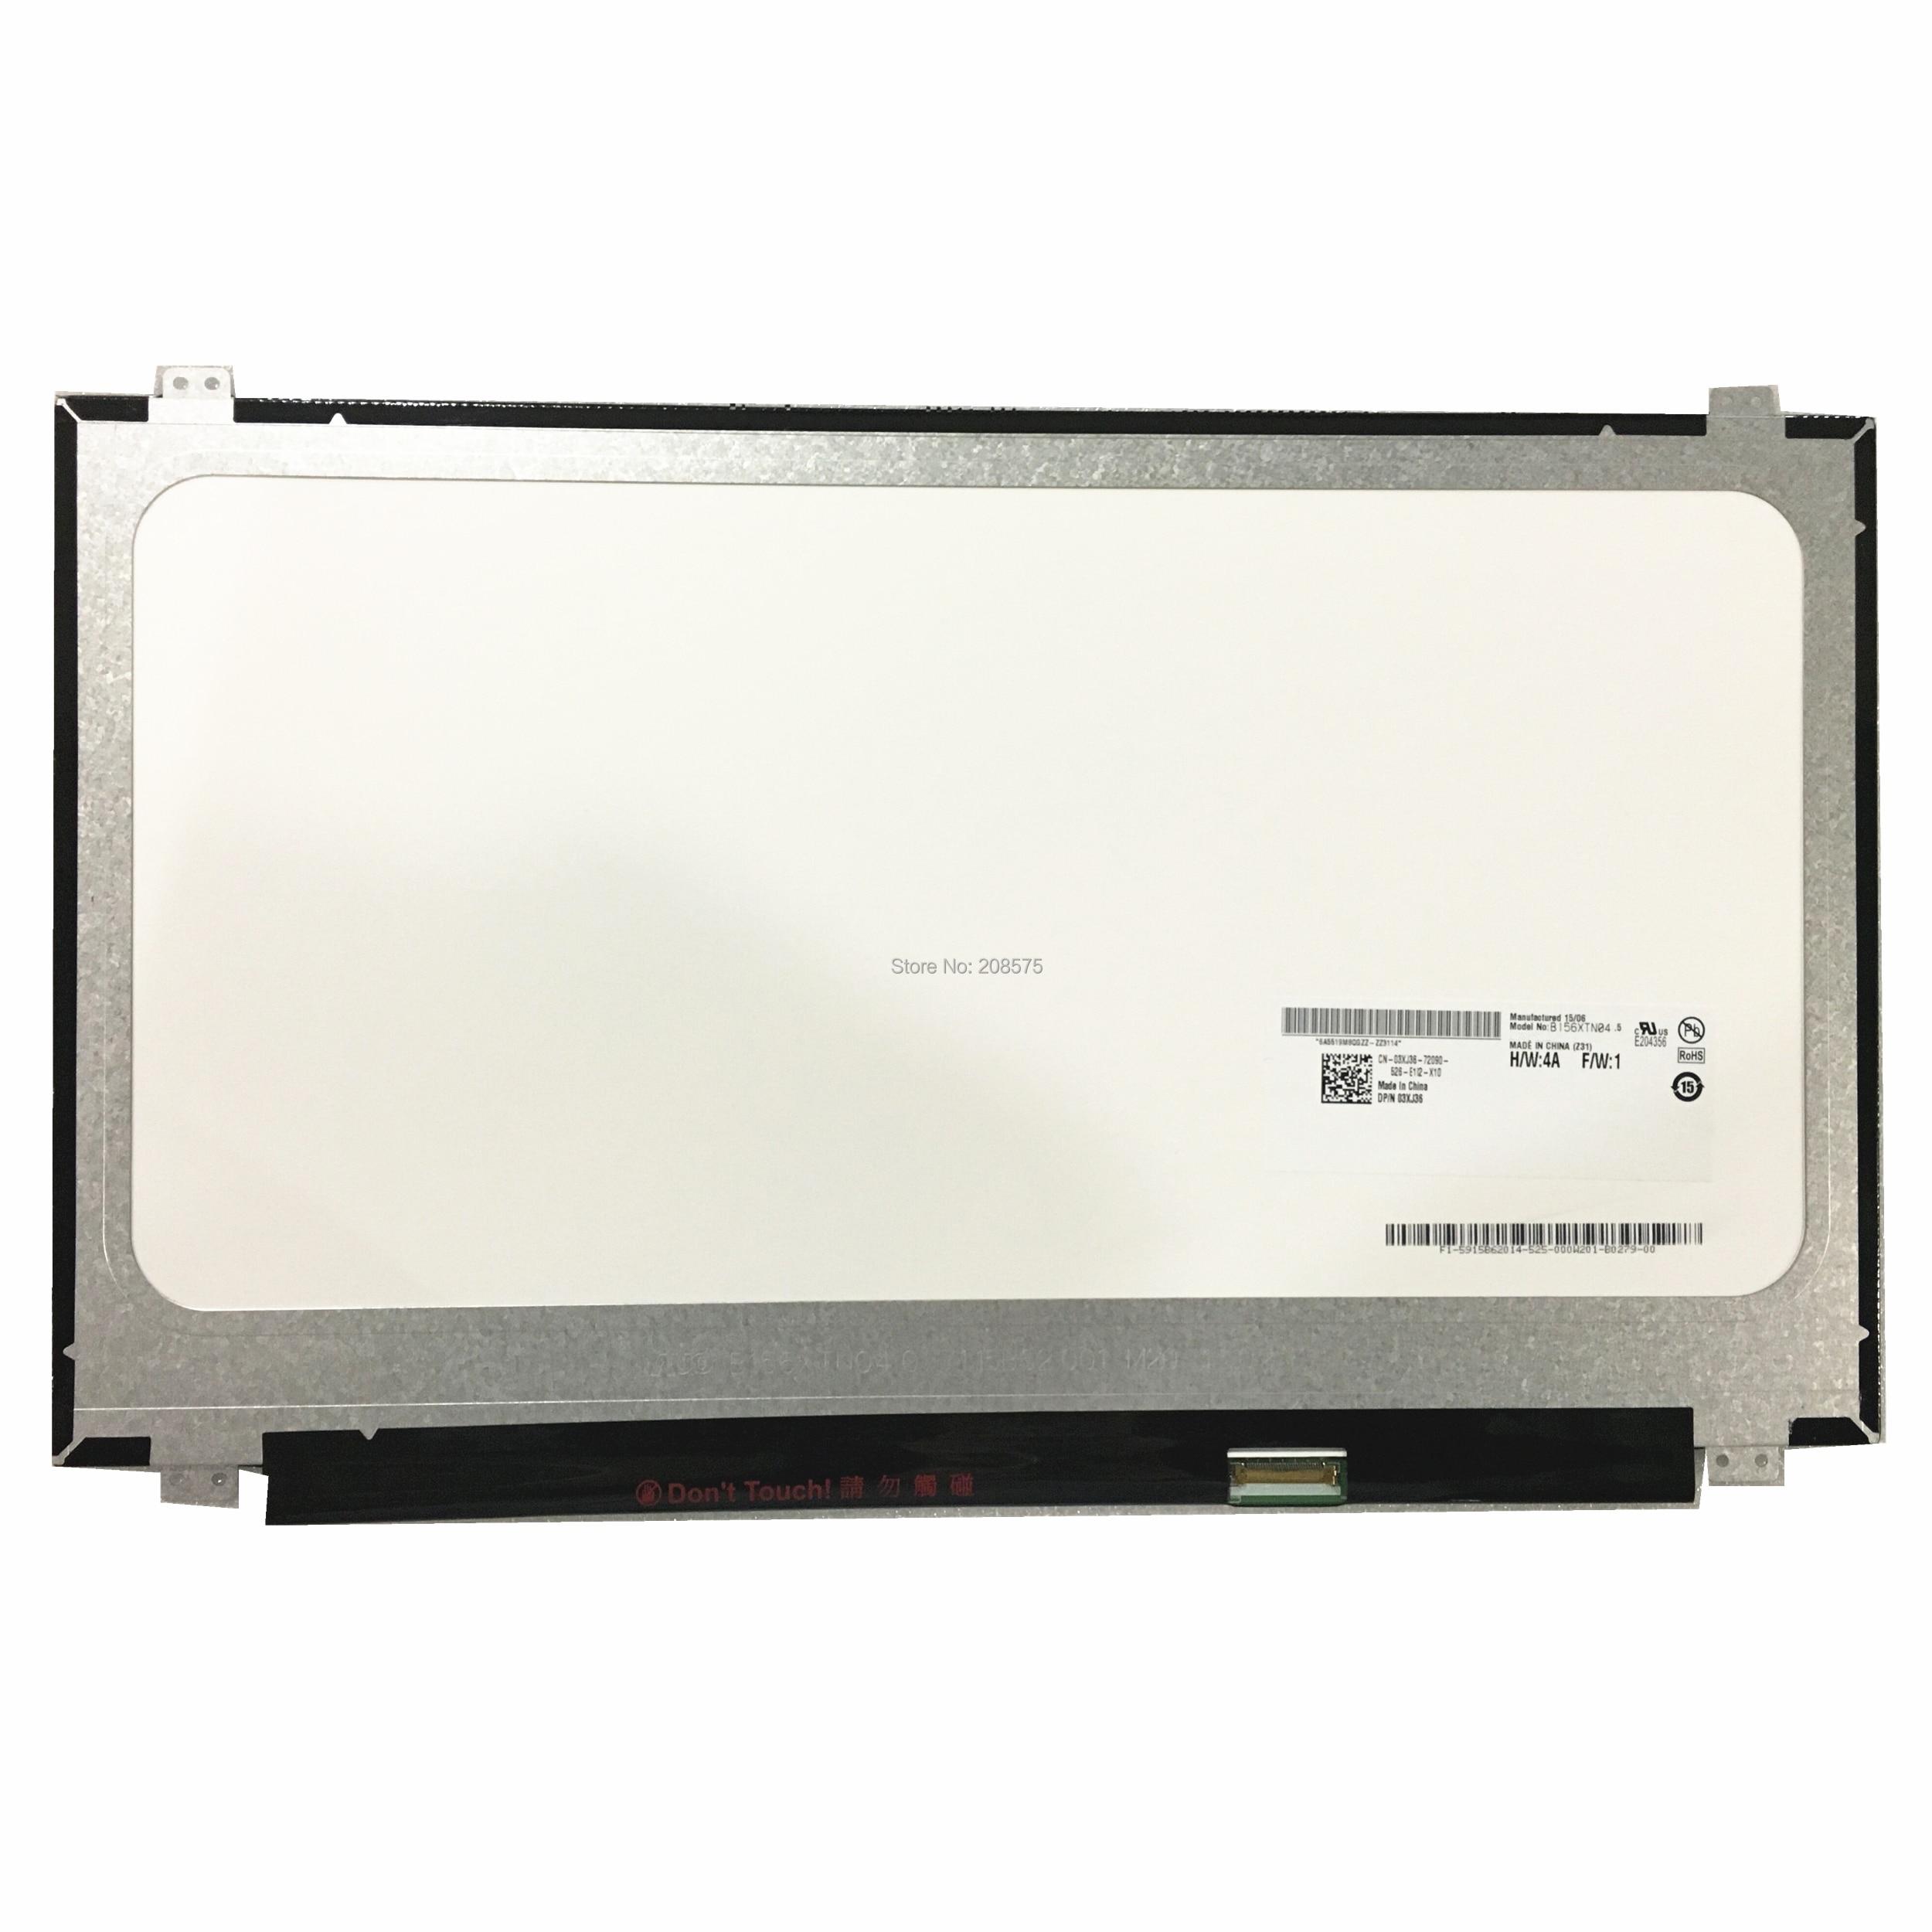 شحن مجاني B156XTN04.5 B156XTN04.1 B156XTN04.6 B156XTN04.4 B156XW04 V.7 N156BGE-EB2 E32 محمول LCD شاشة 1366*768 EDP 30pin